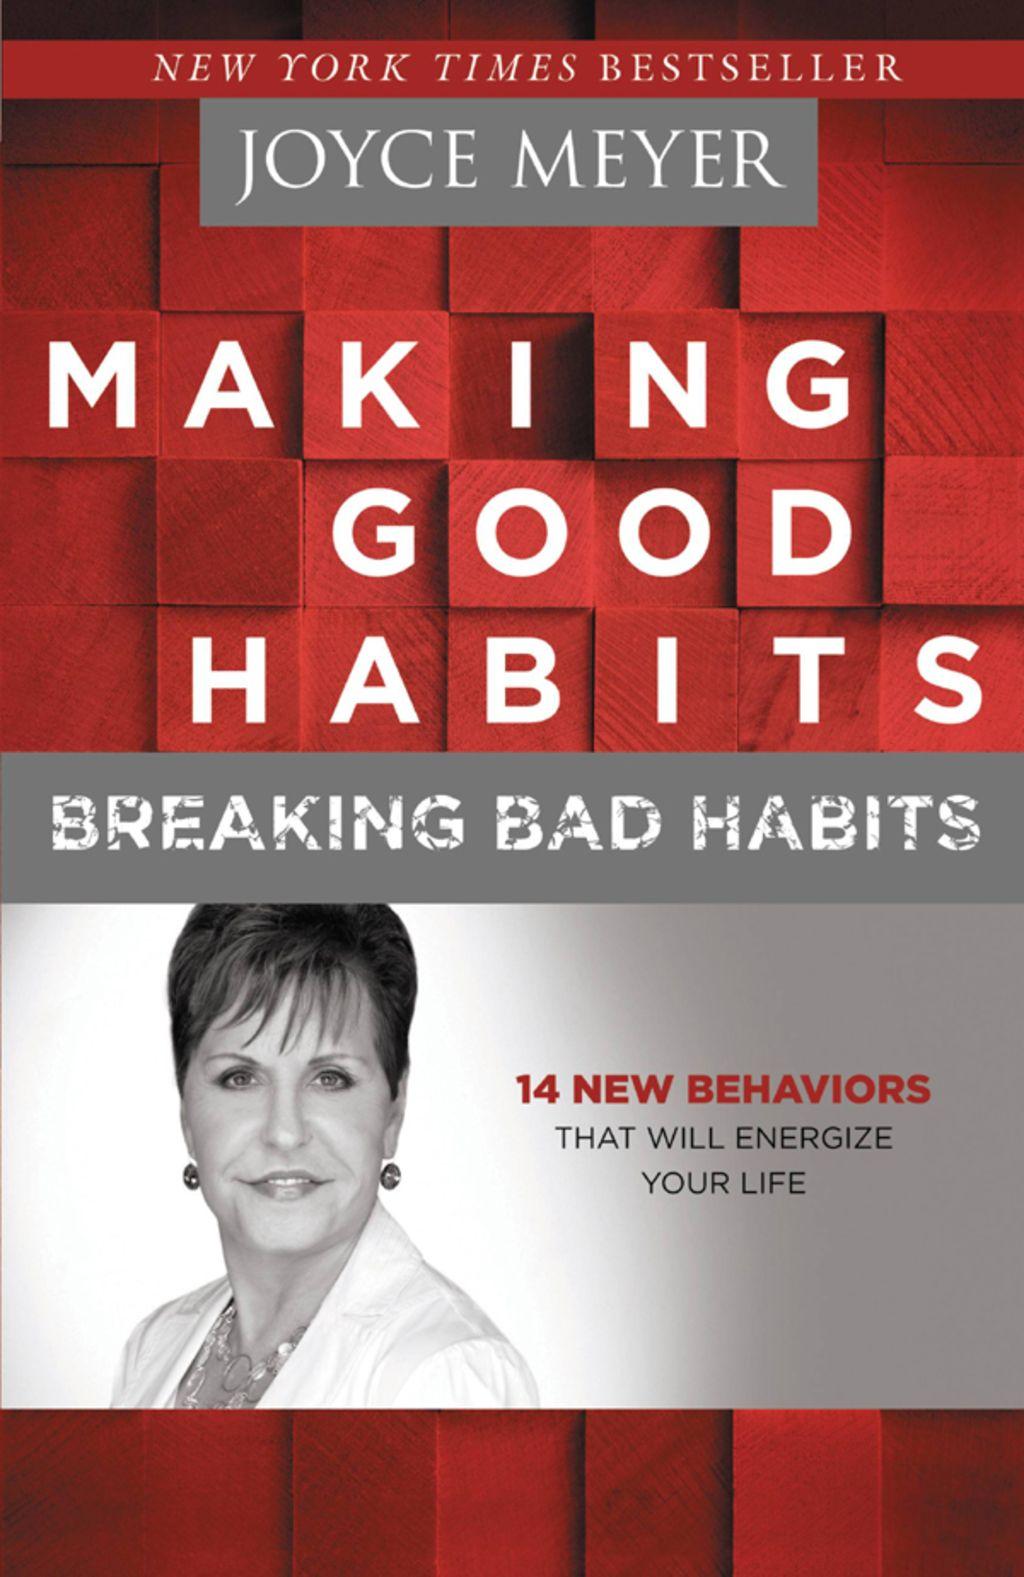 Making Good Habits Breaking Bad Habits Ebook